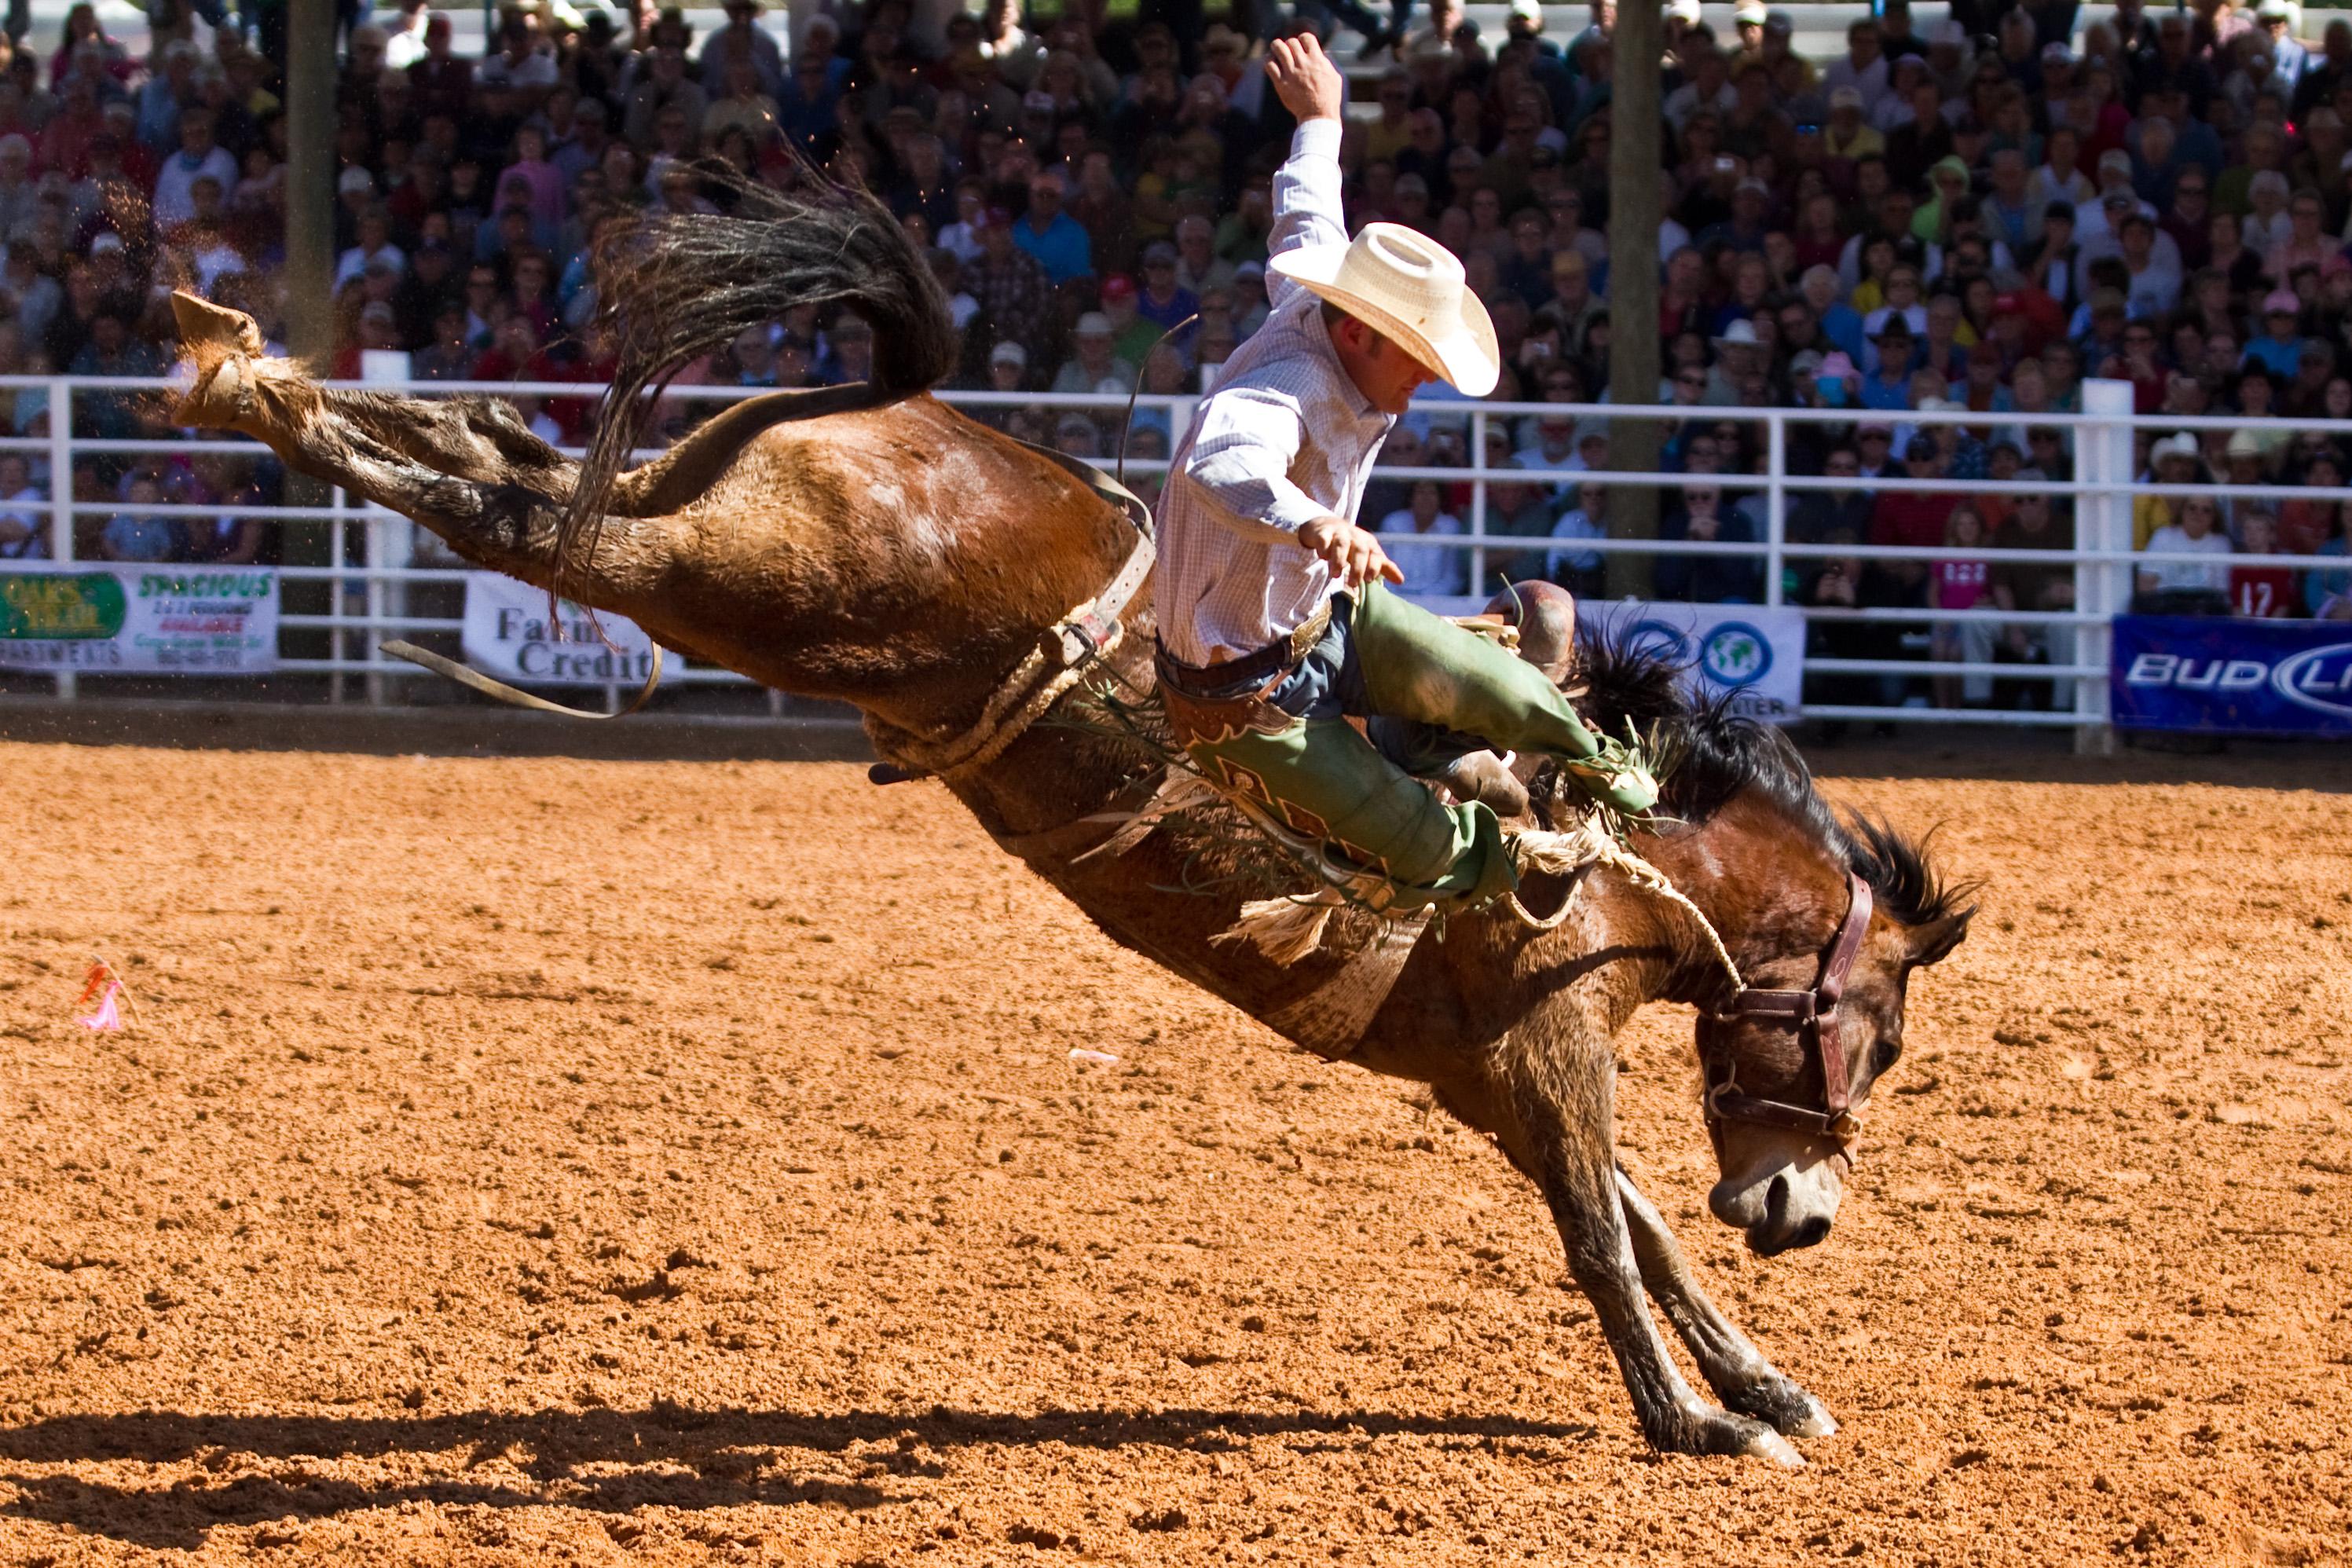 Arcadia Rodeo Desoto County FL 2017 Things to do visitdesoto.com bronc riding